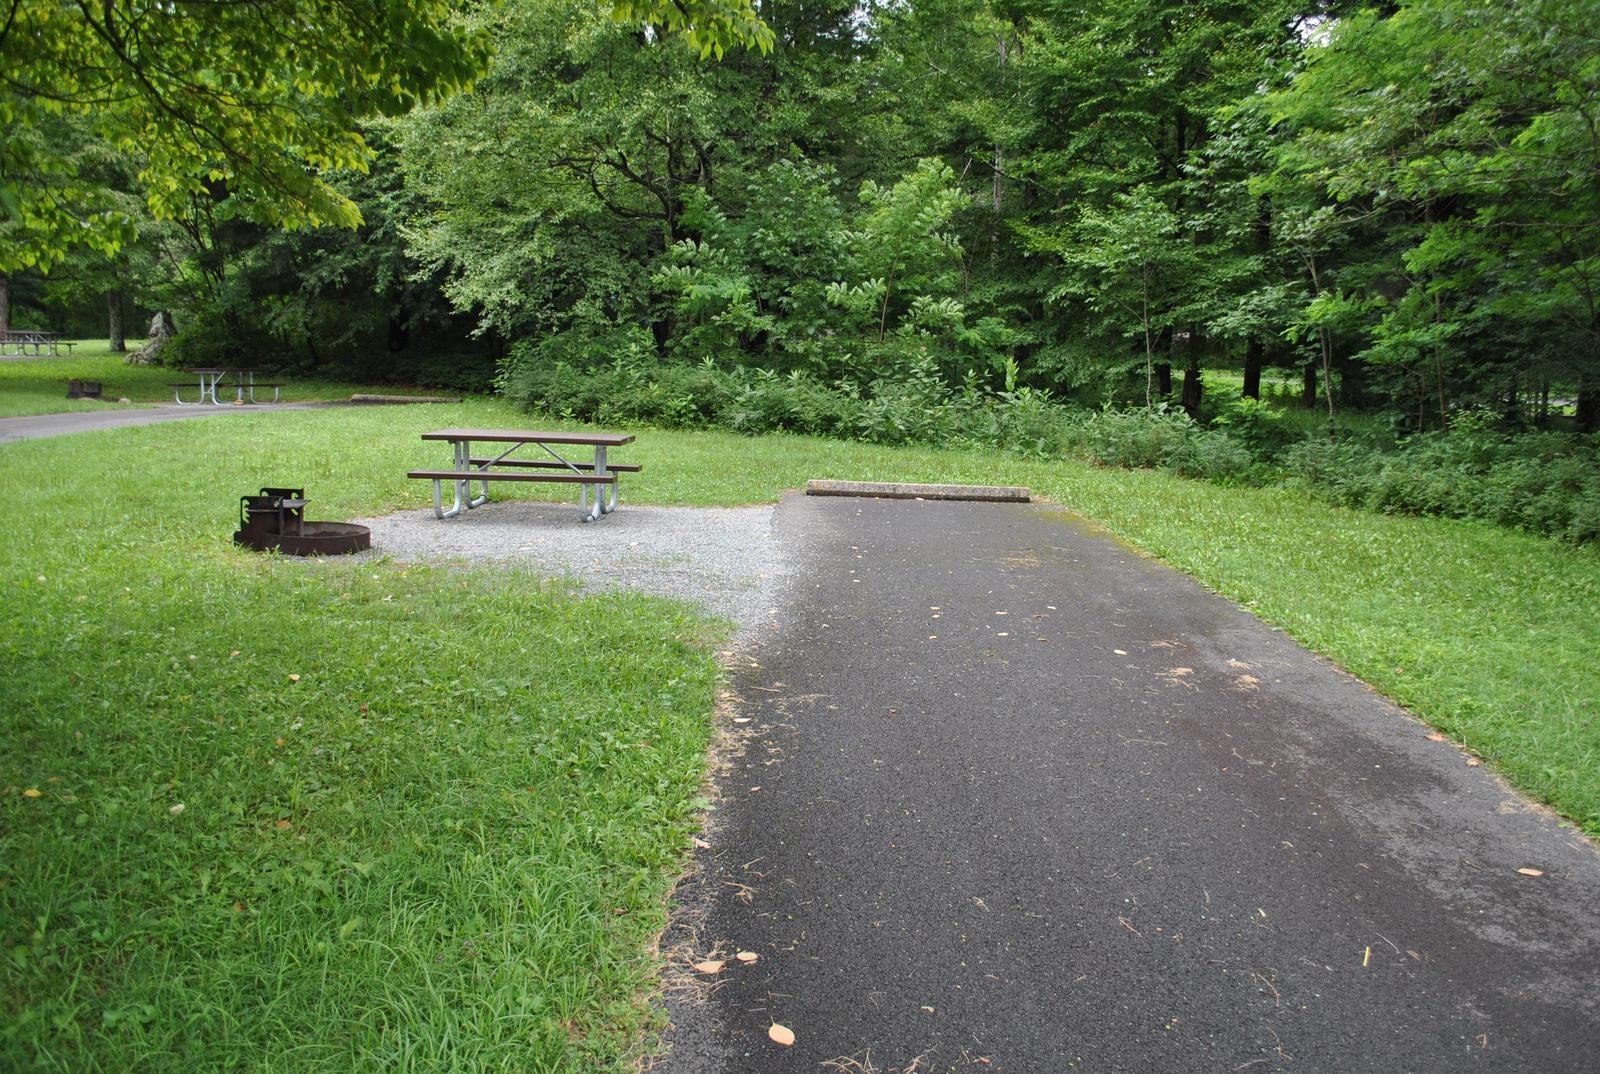 Mathews Arm Campground – Site A103